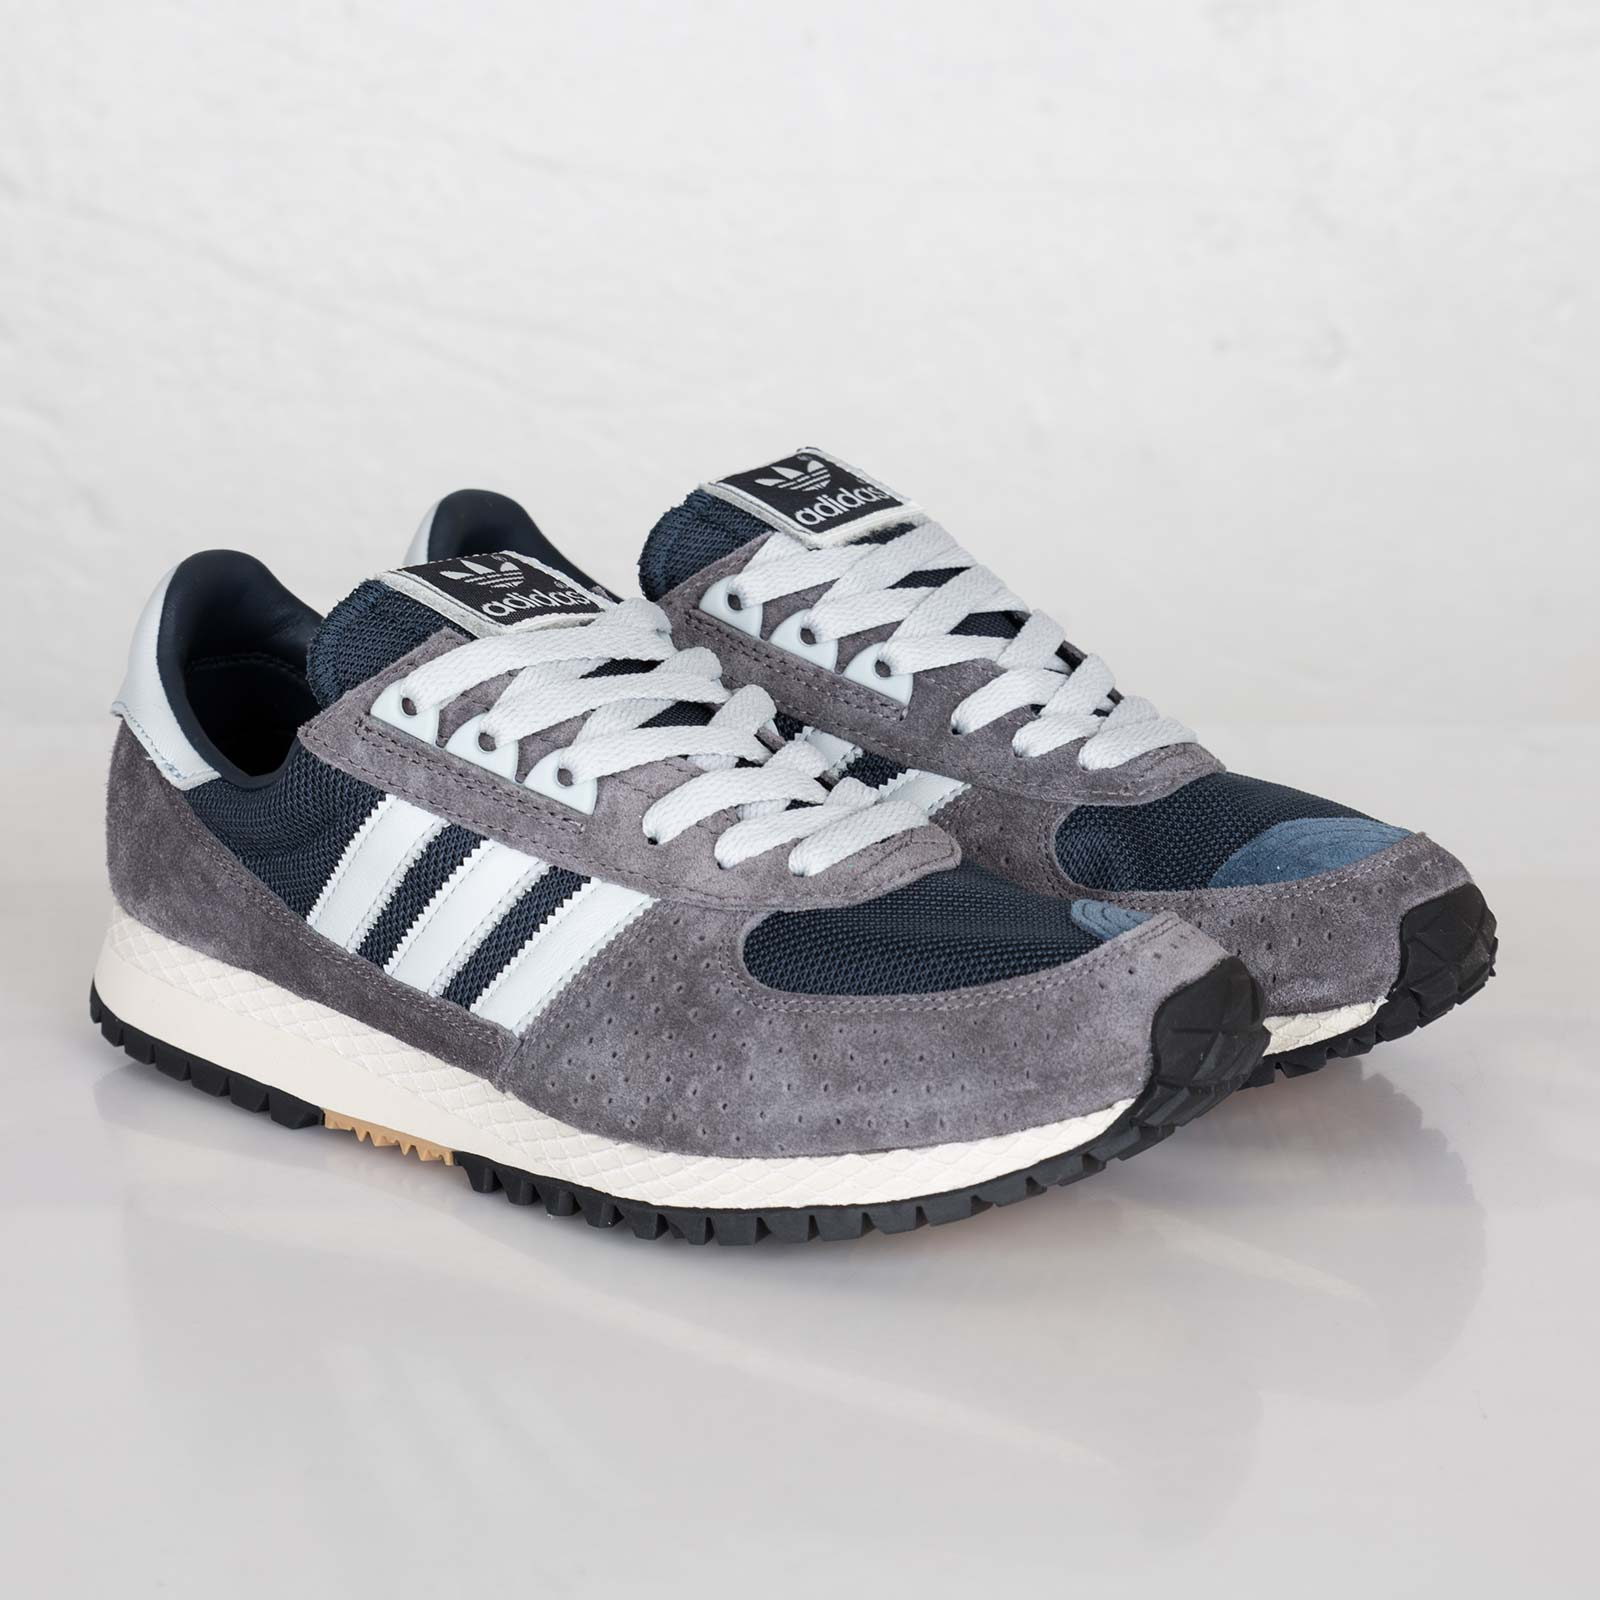 e7095eb8c3a adidas City Marathon PT 42/195 - D67349 - Sneakersnstuff | sneakers ...